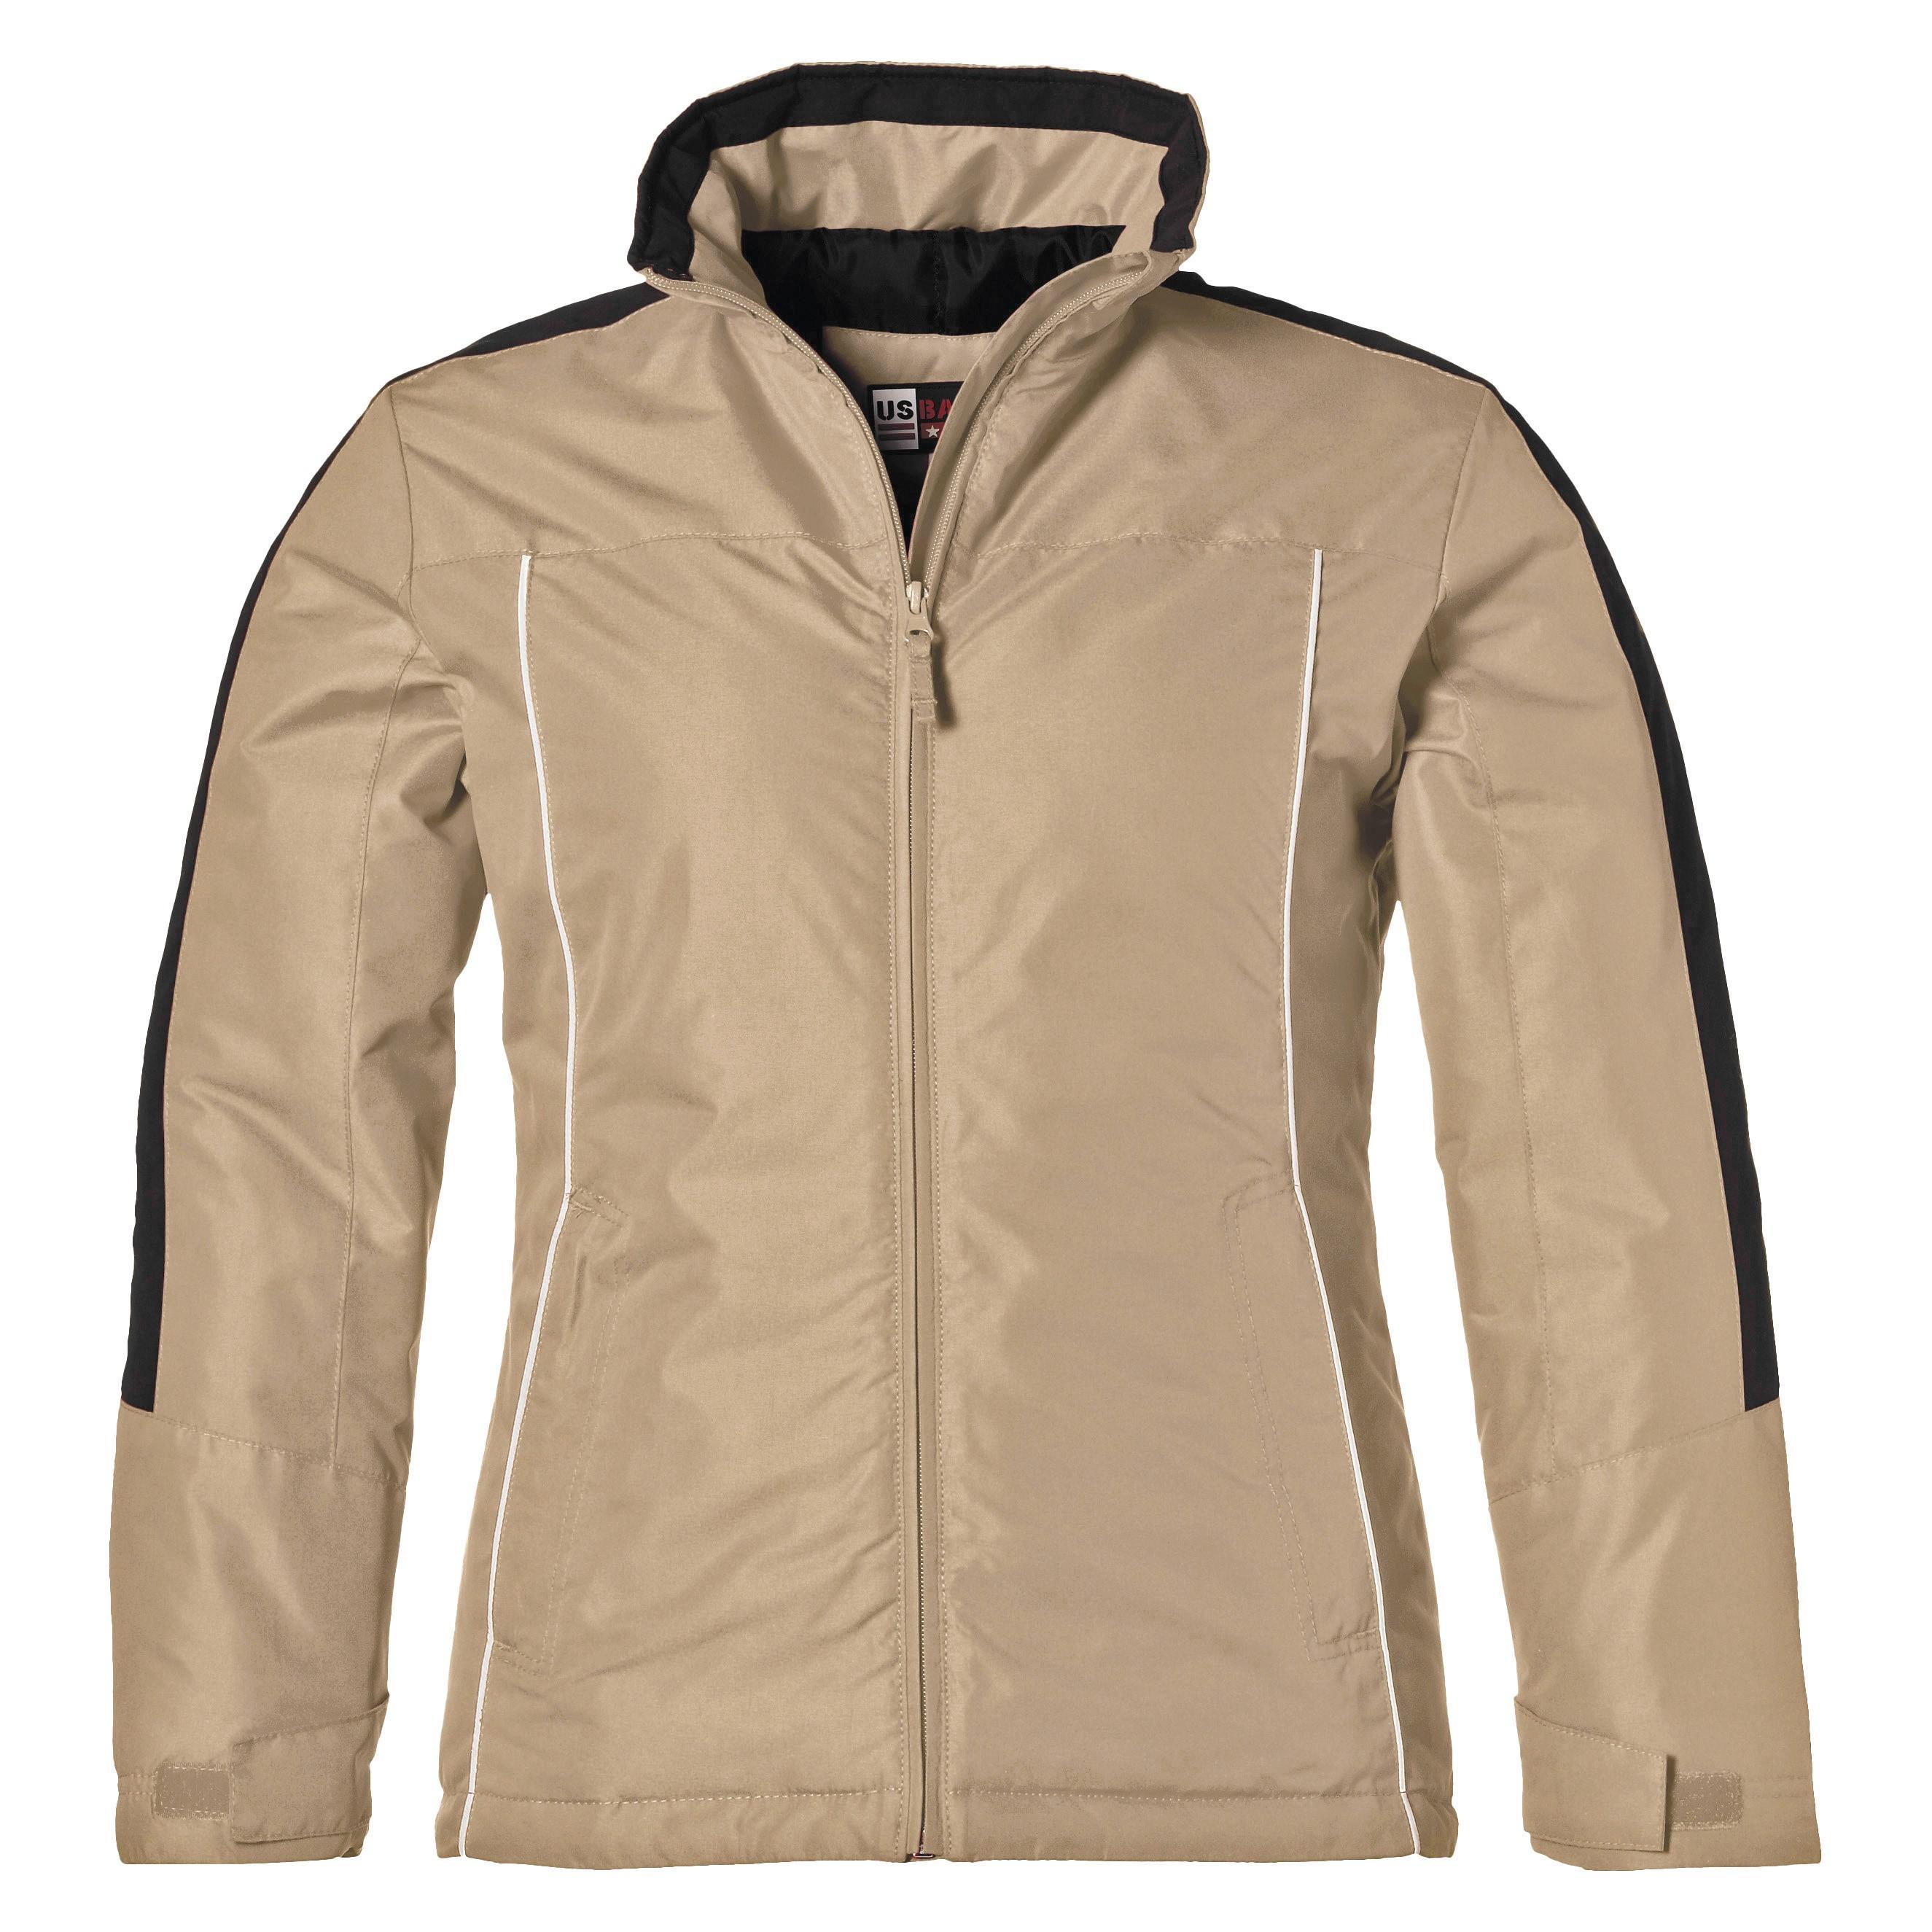 Ladies Calibri Winter Jacket - Khaki Only